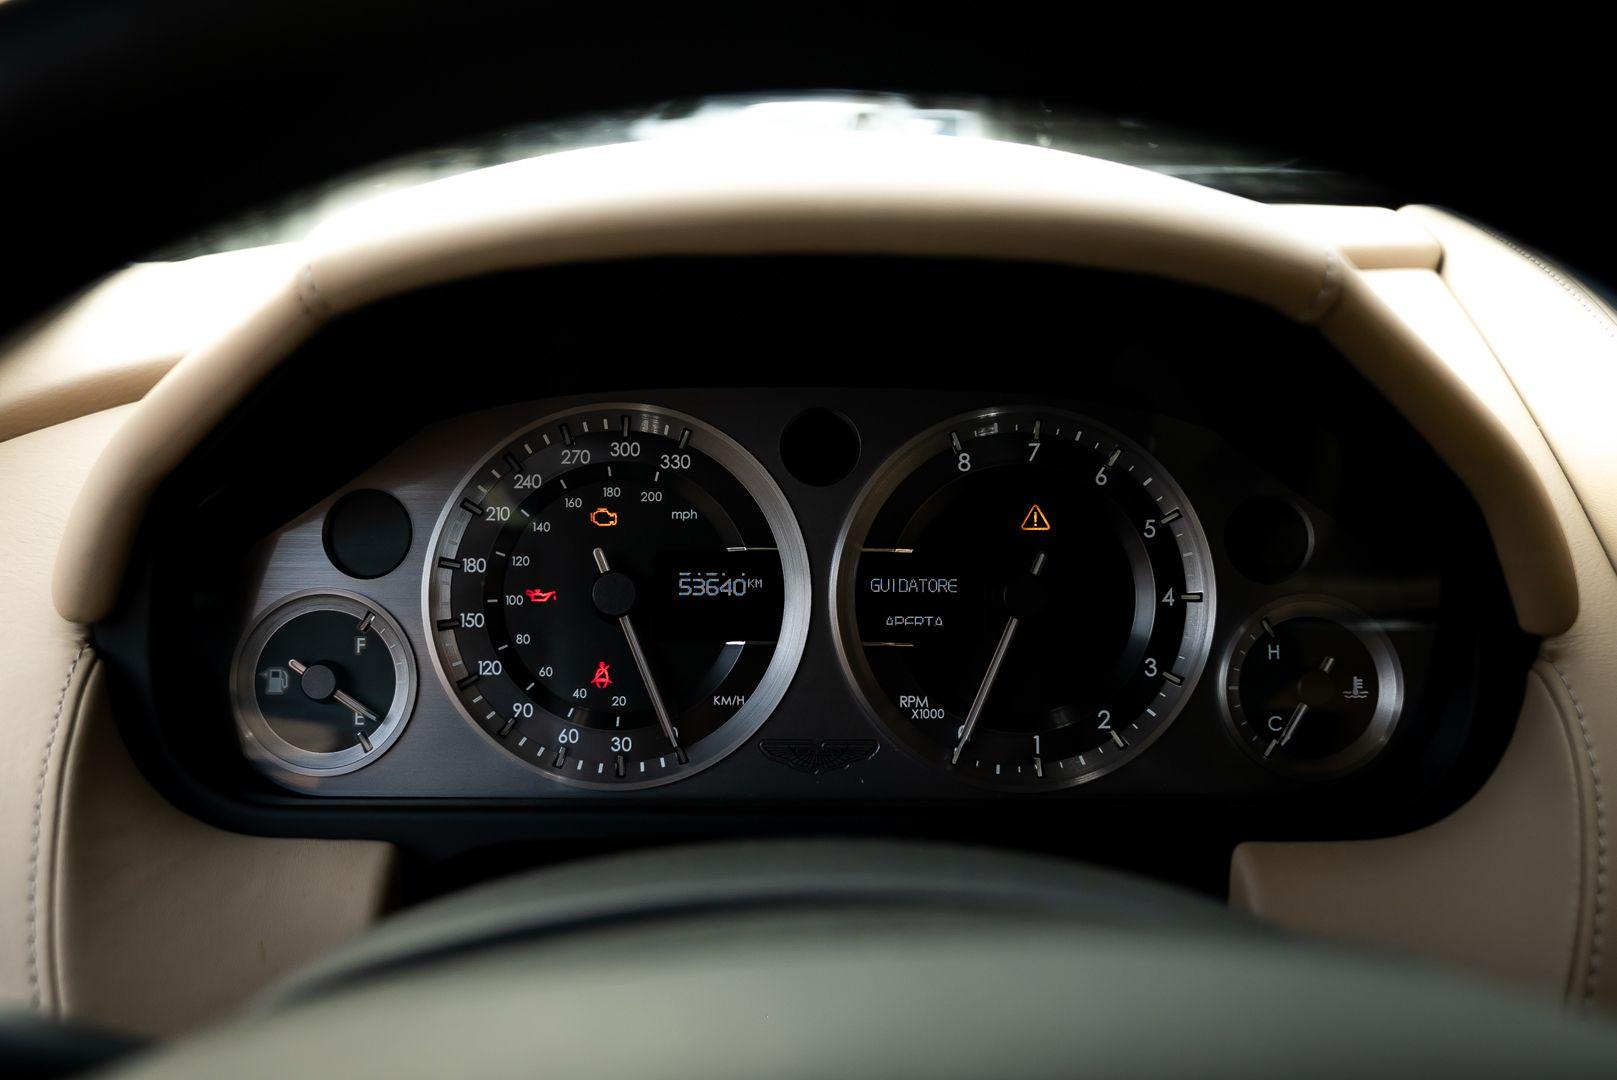 2008 Aston Martin 4.3 V8 Vantage Roadster N400 82819